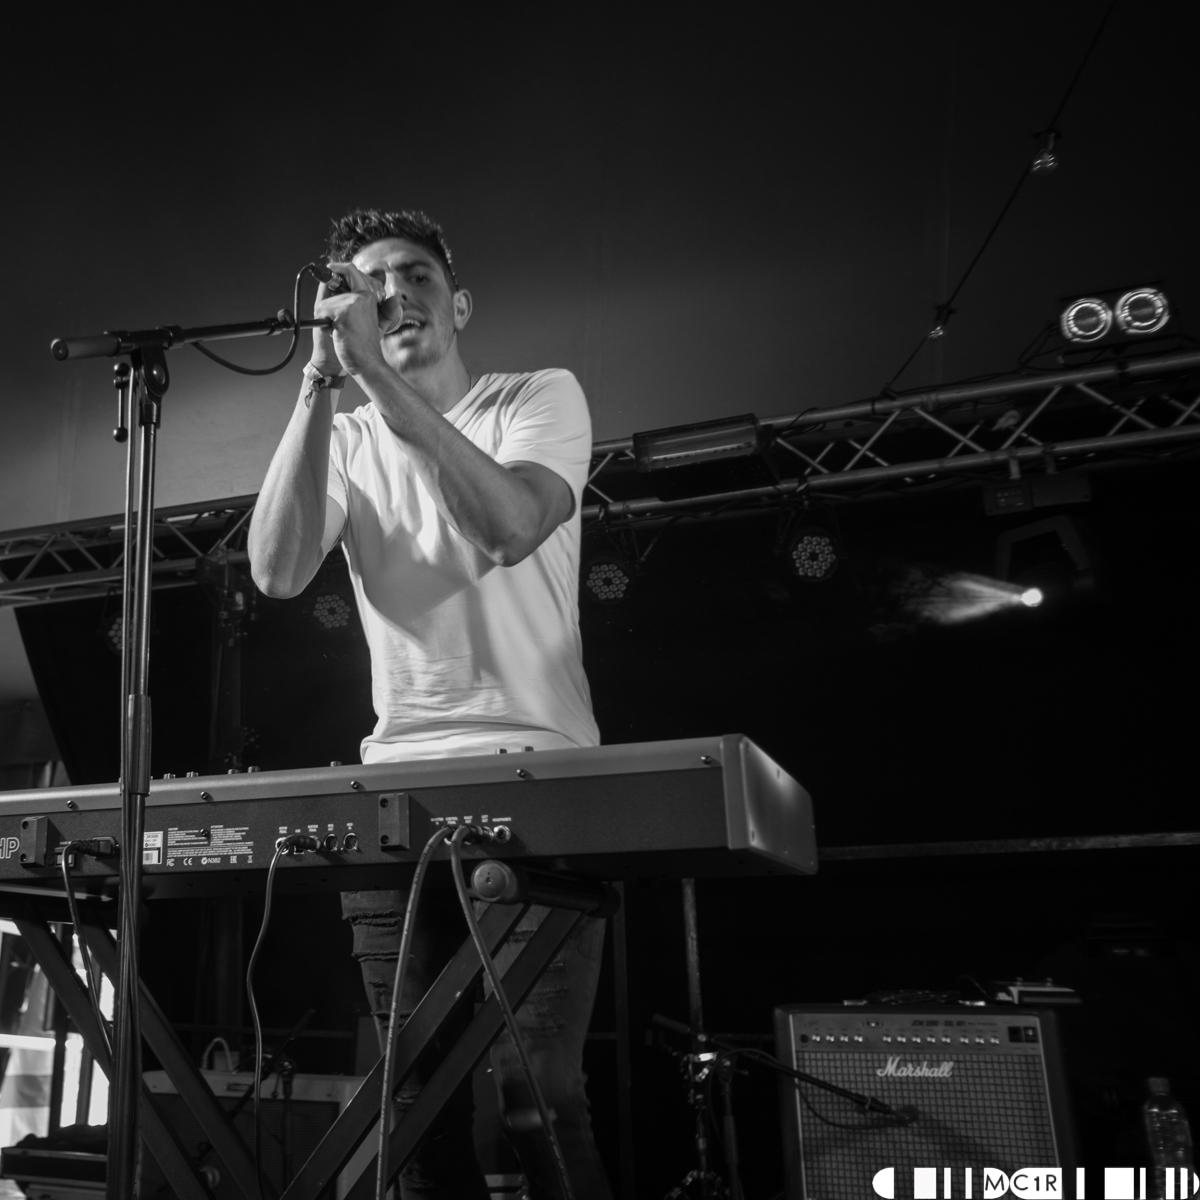 Torridon at Belladrum 2018 2 - The Bands of Belladrum 2018 - IMAGES